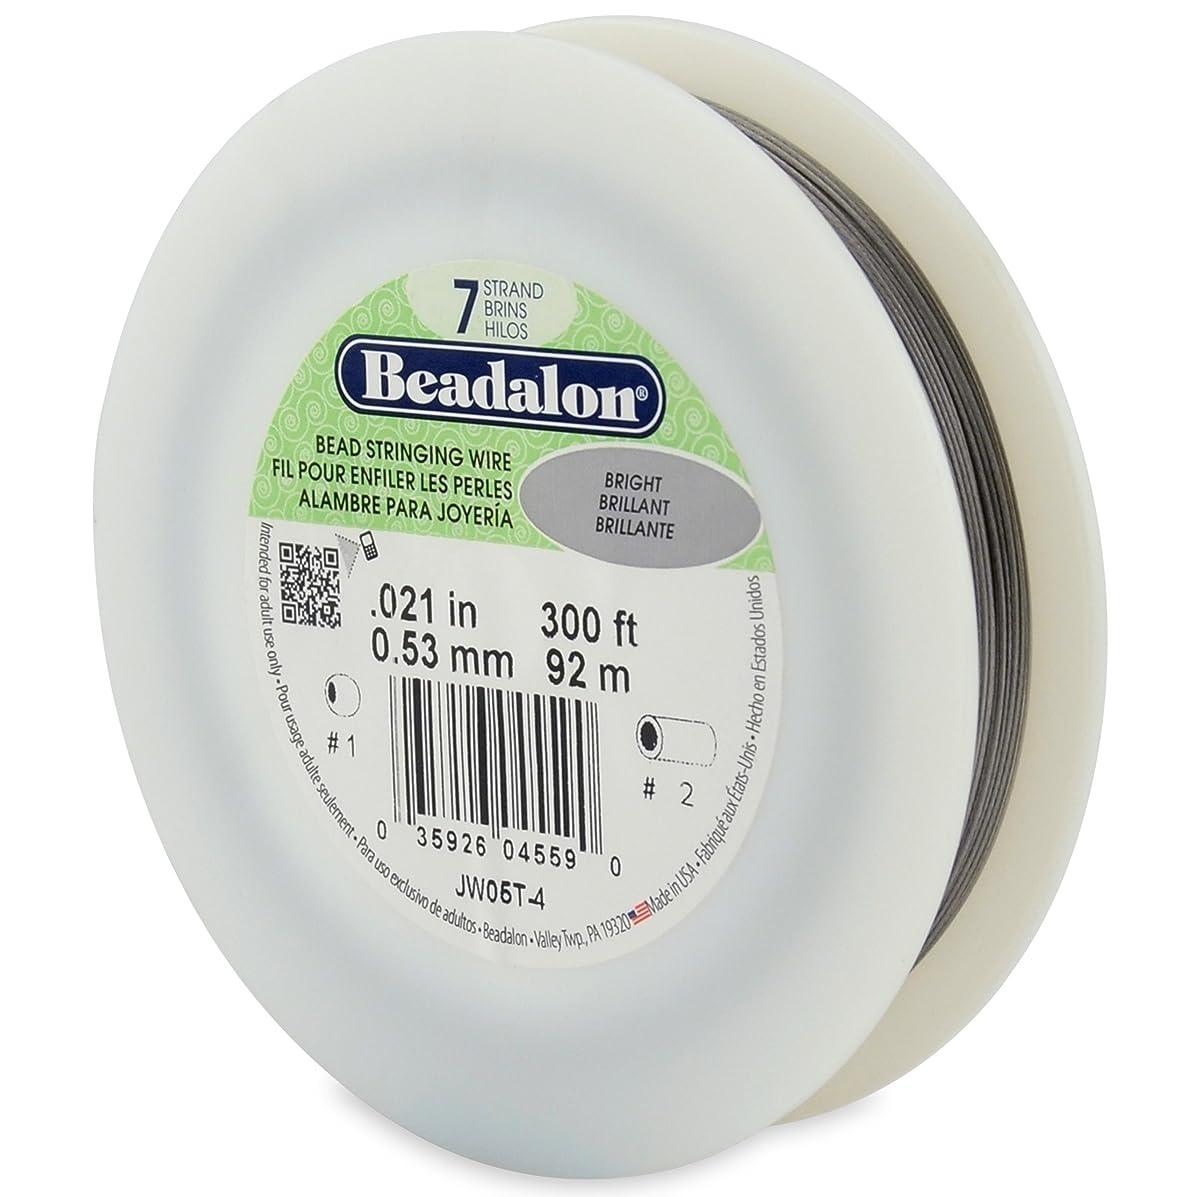 Beadalon 7-Strand 0.021